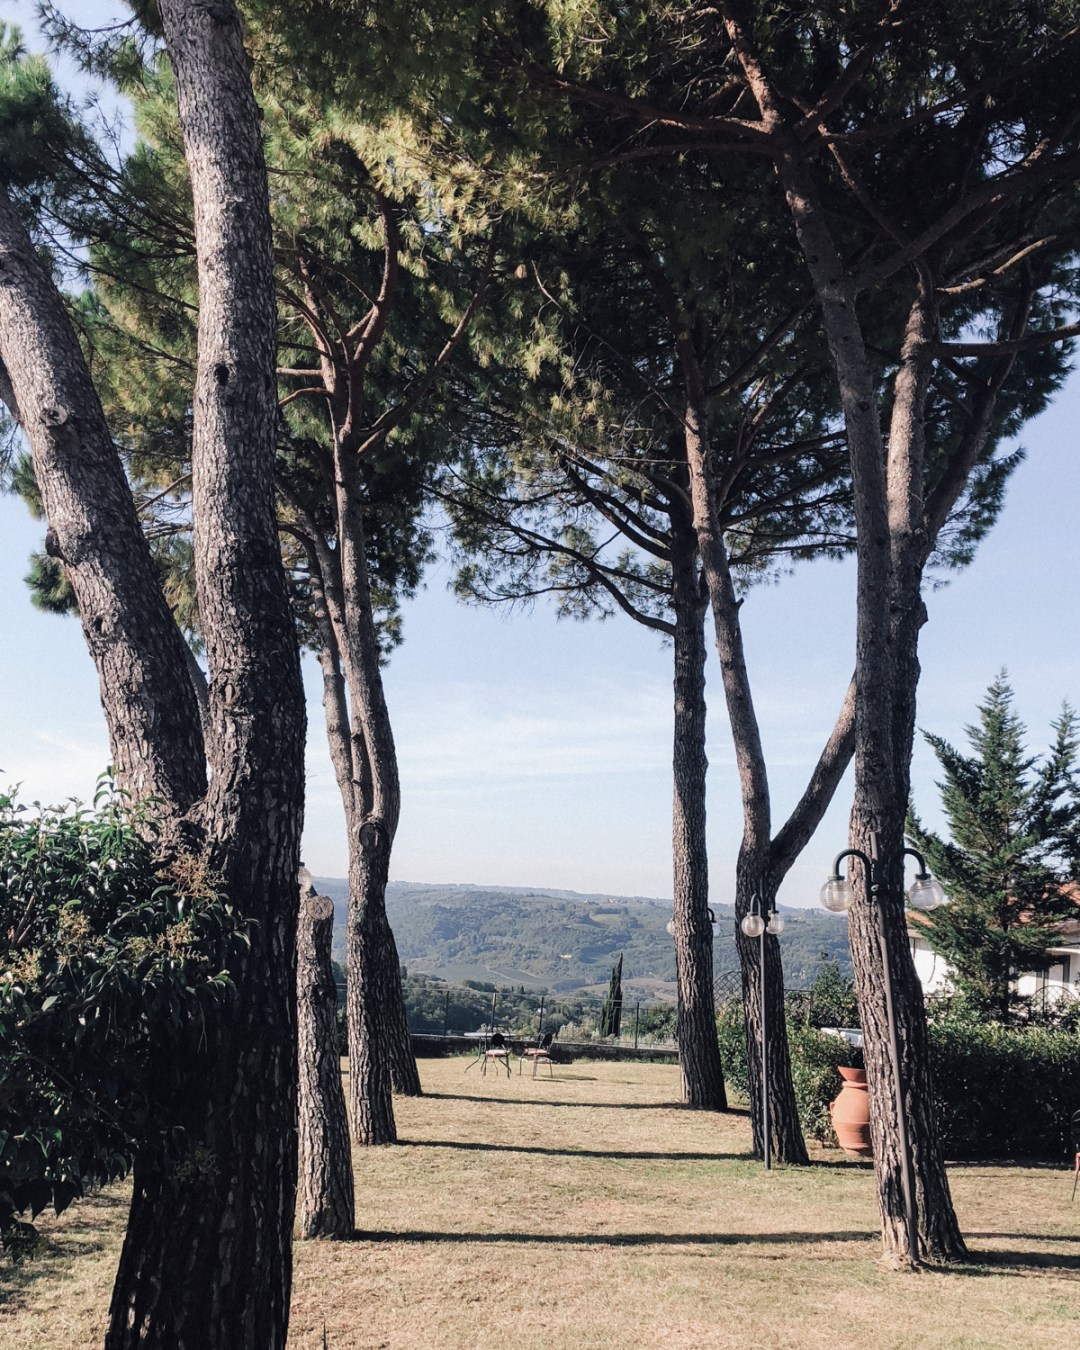 inastil, Ü50Blogger, Reiseblogger, Toskana, Villa, Florenz, Siena, Certaldo, Lifestyle, Italienreise, Italienliebe, Cabriotour-45